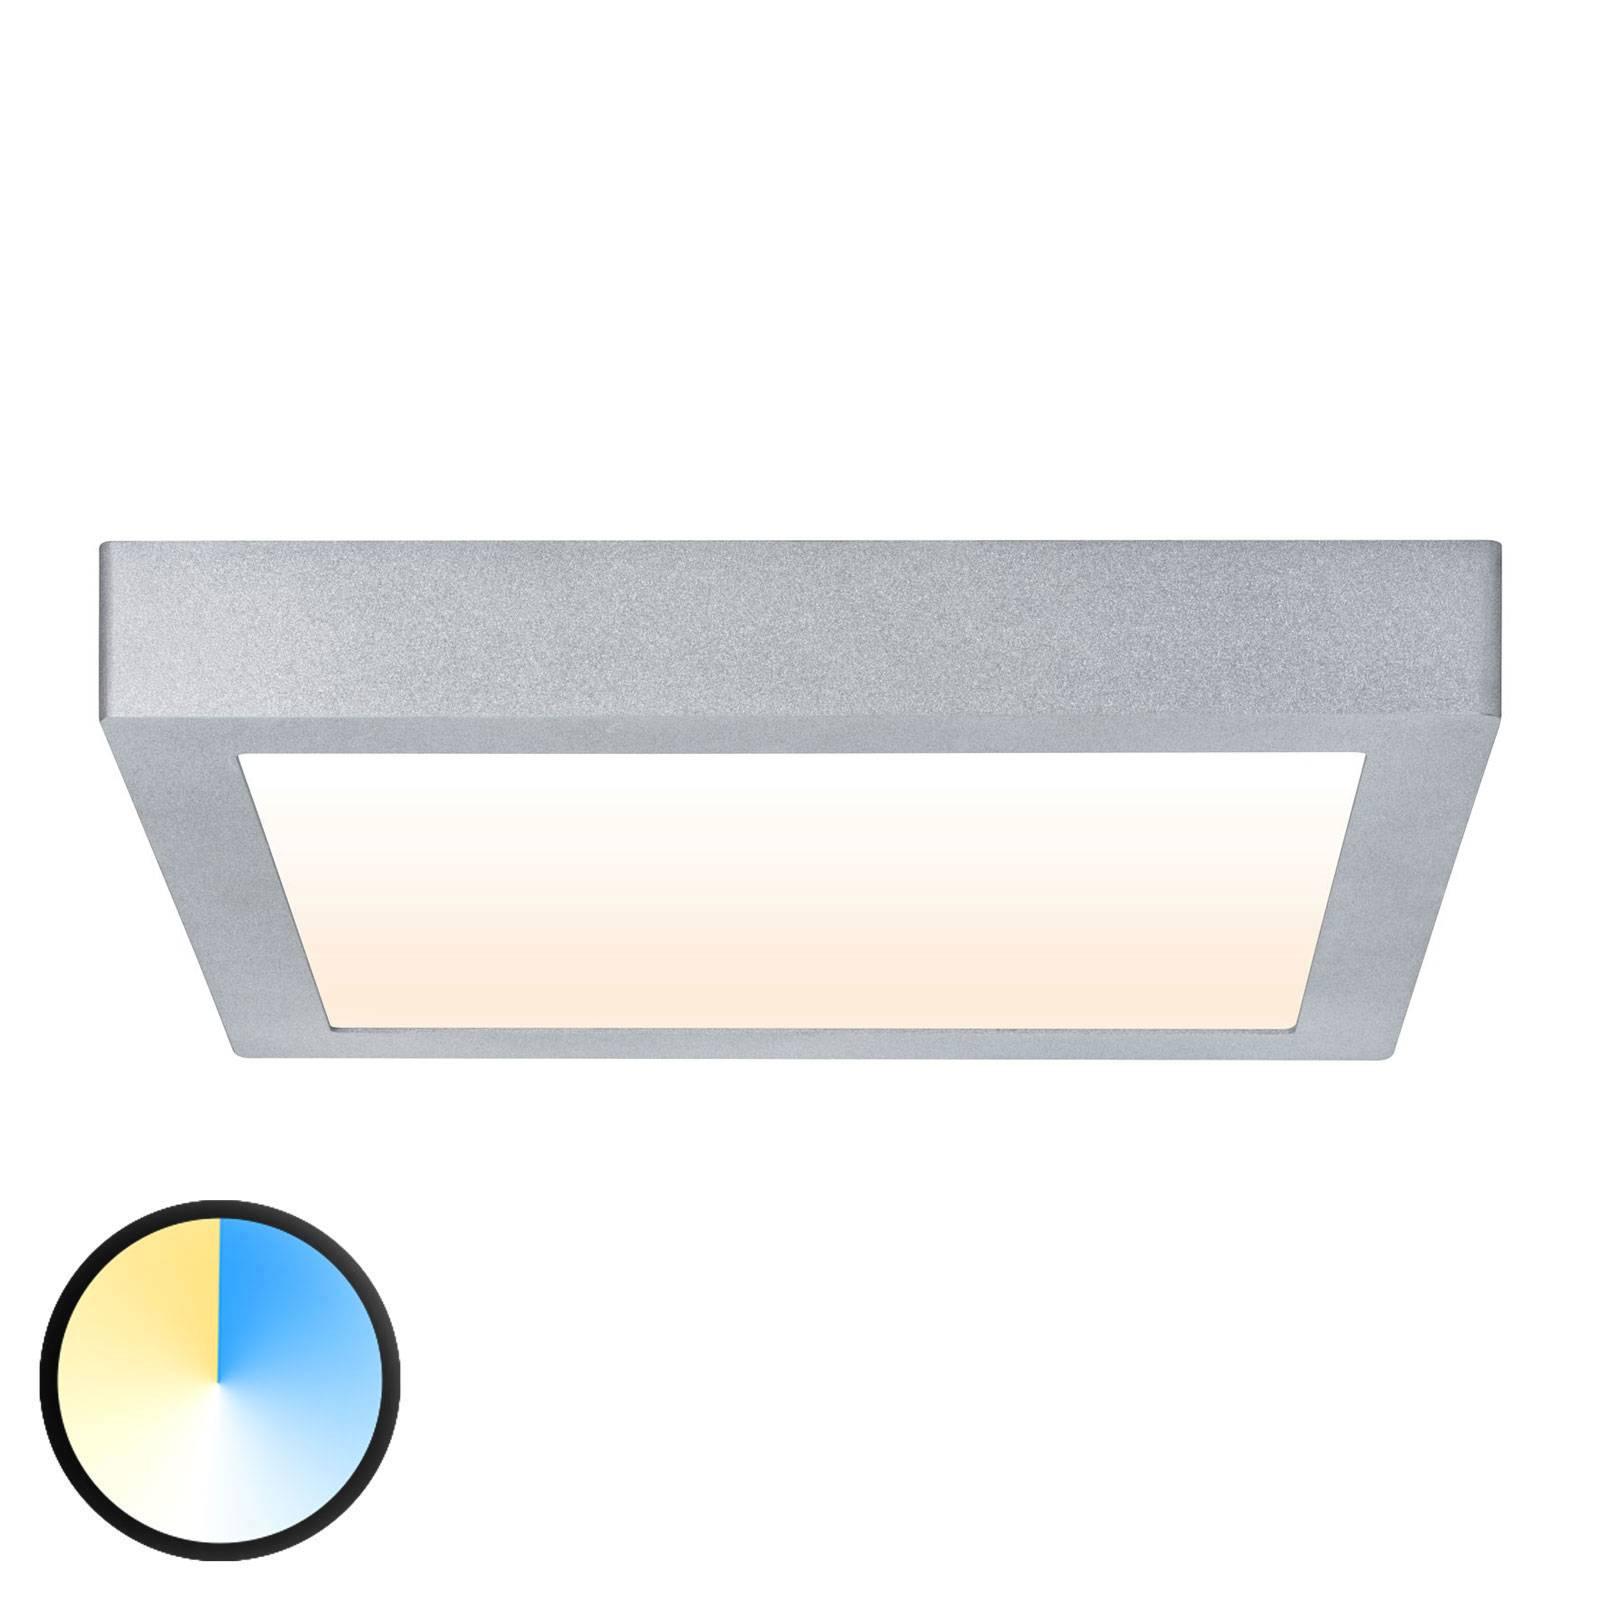 Paulmann Carpo -LED-kattovalaisin 30 x 30 cm